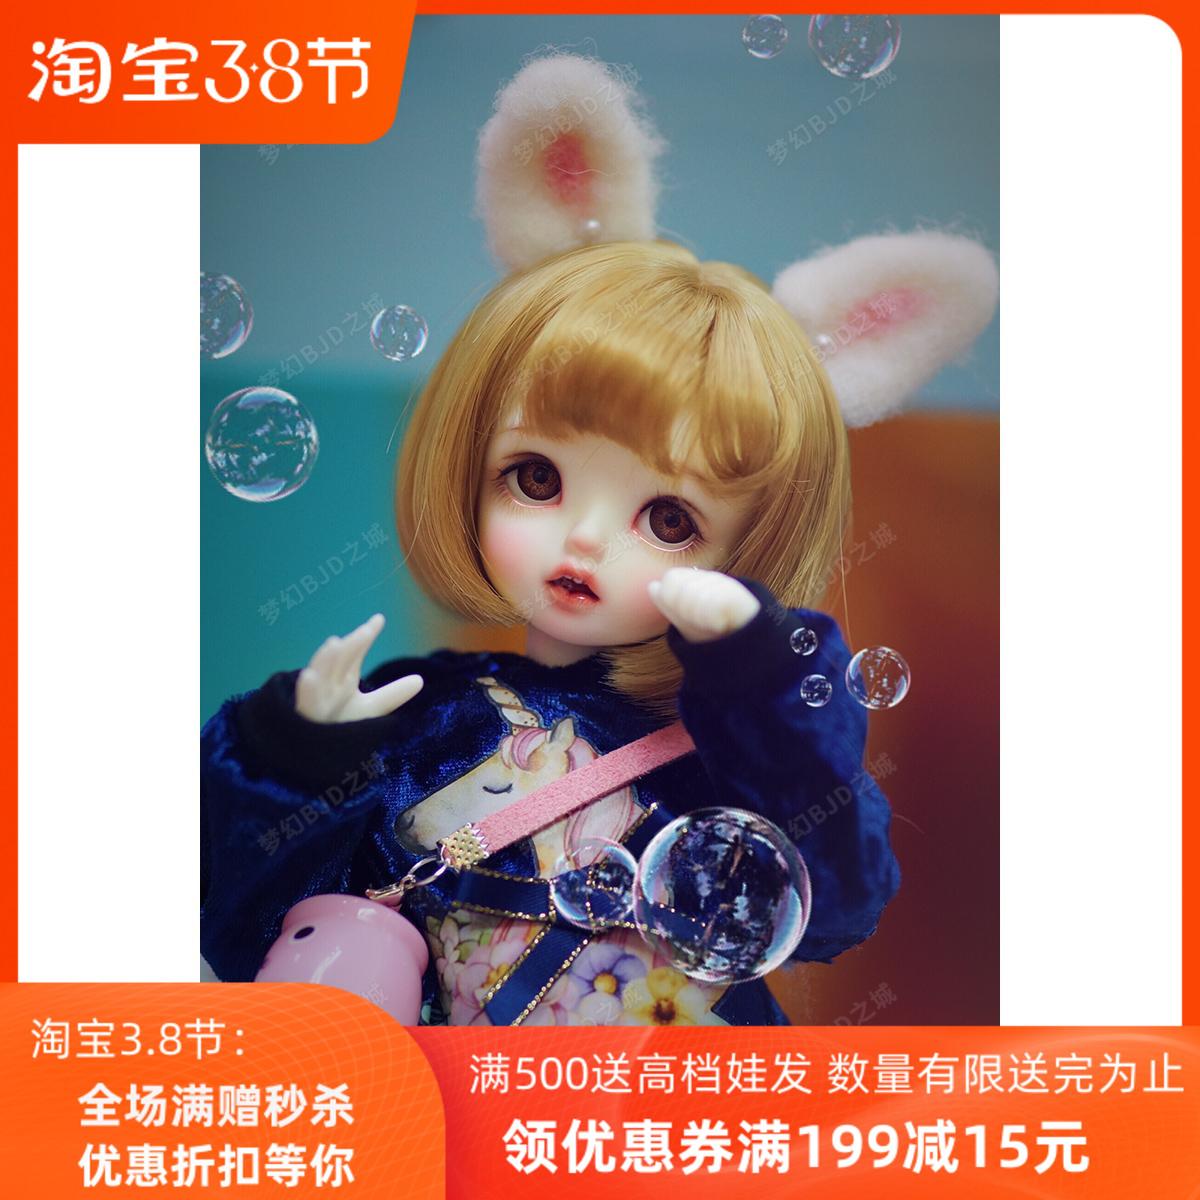 6 min BJD doll SD doll Carol card meat ball joint resin can move humanoid doll budding girl